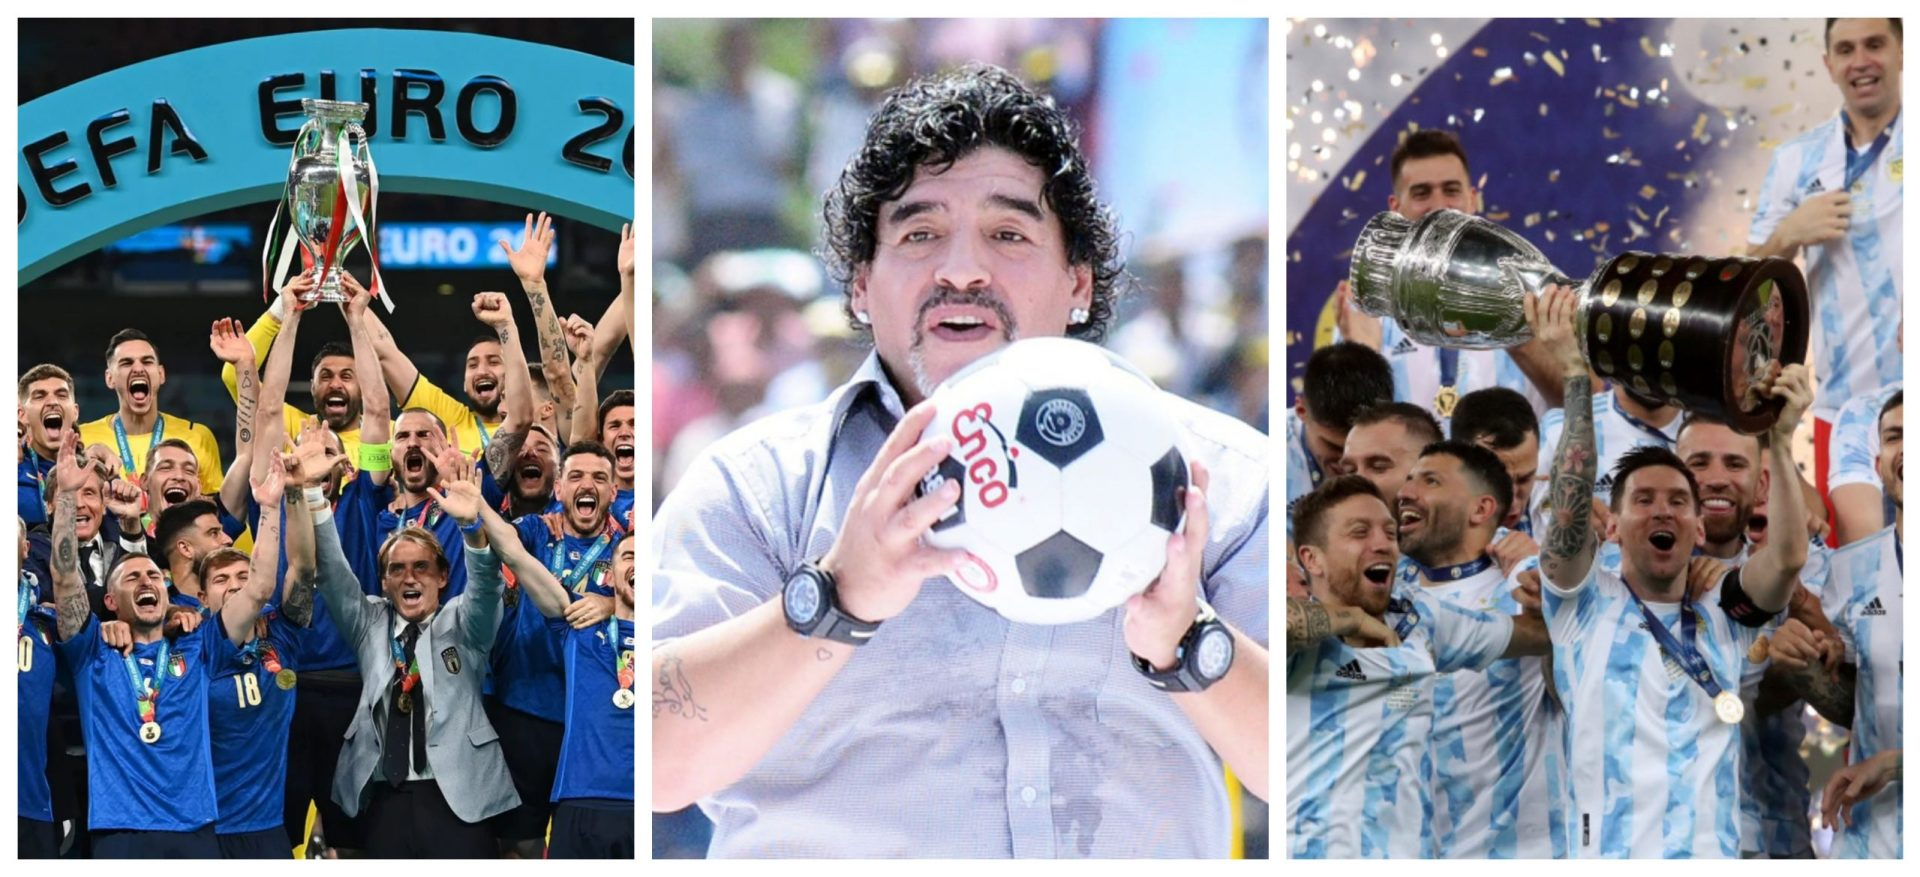 Euro vs Copa America match in works to honour Diego Maradona - THE SPORTS ROOM